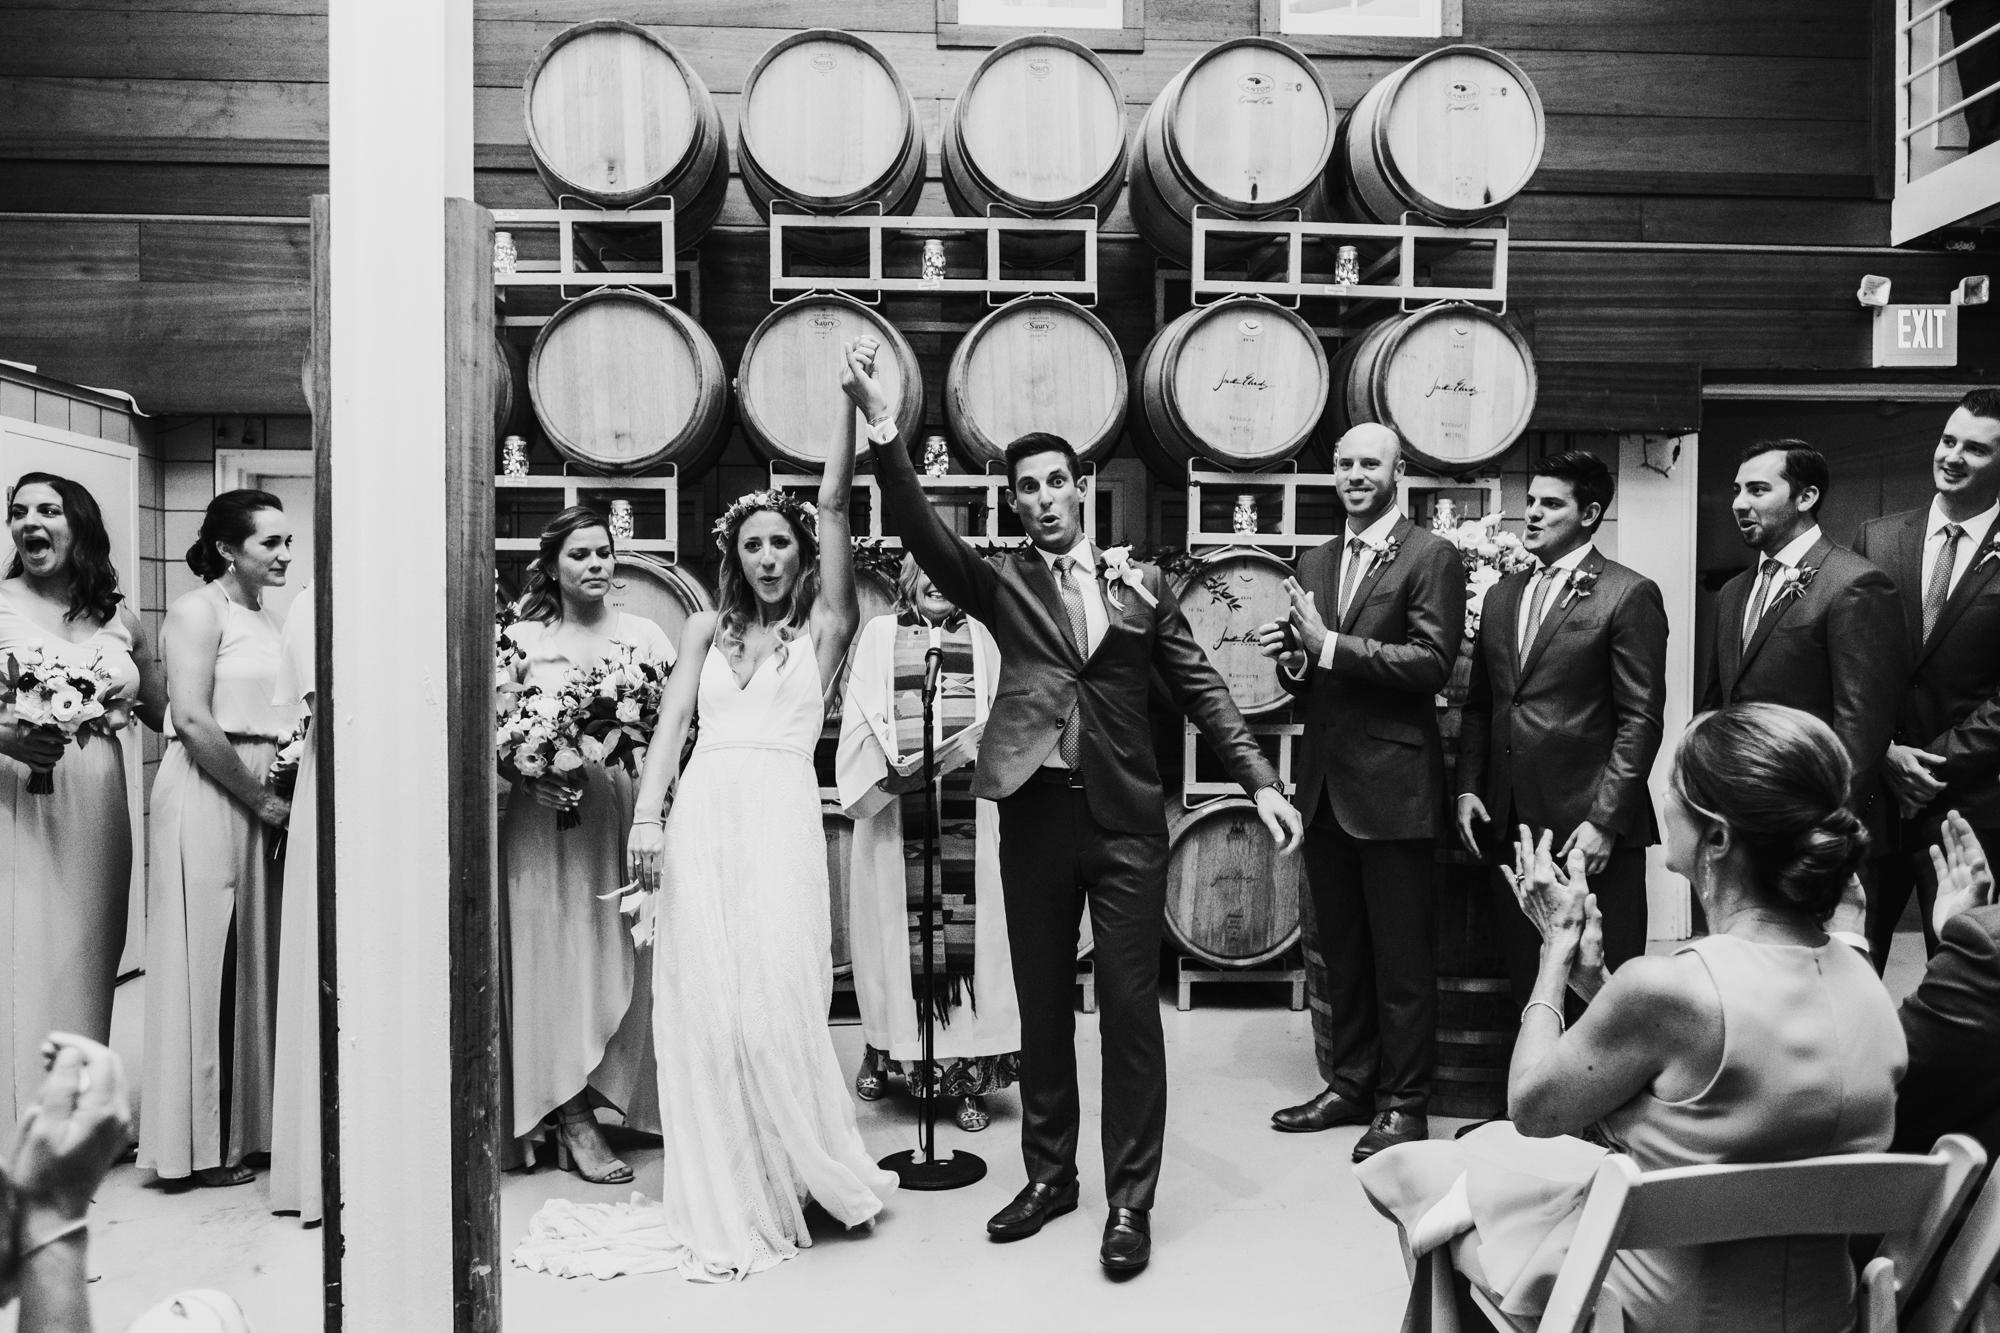 Wedding_Francis_Boucher_Jonathan_Edwards_Winery_2018-47.jpg